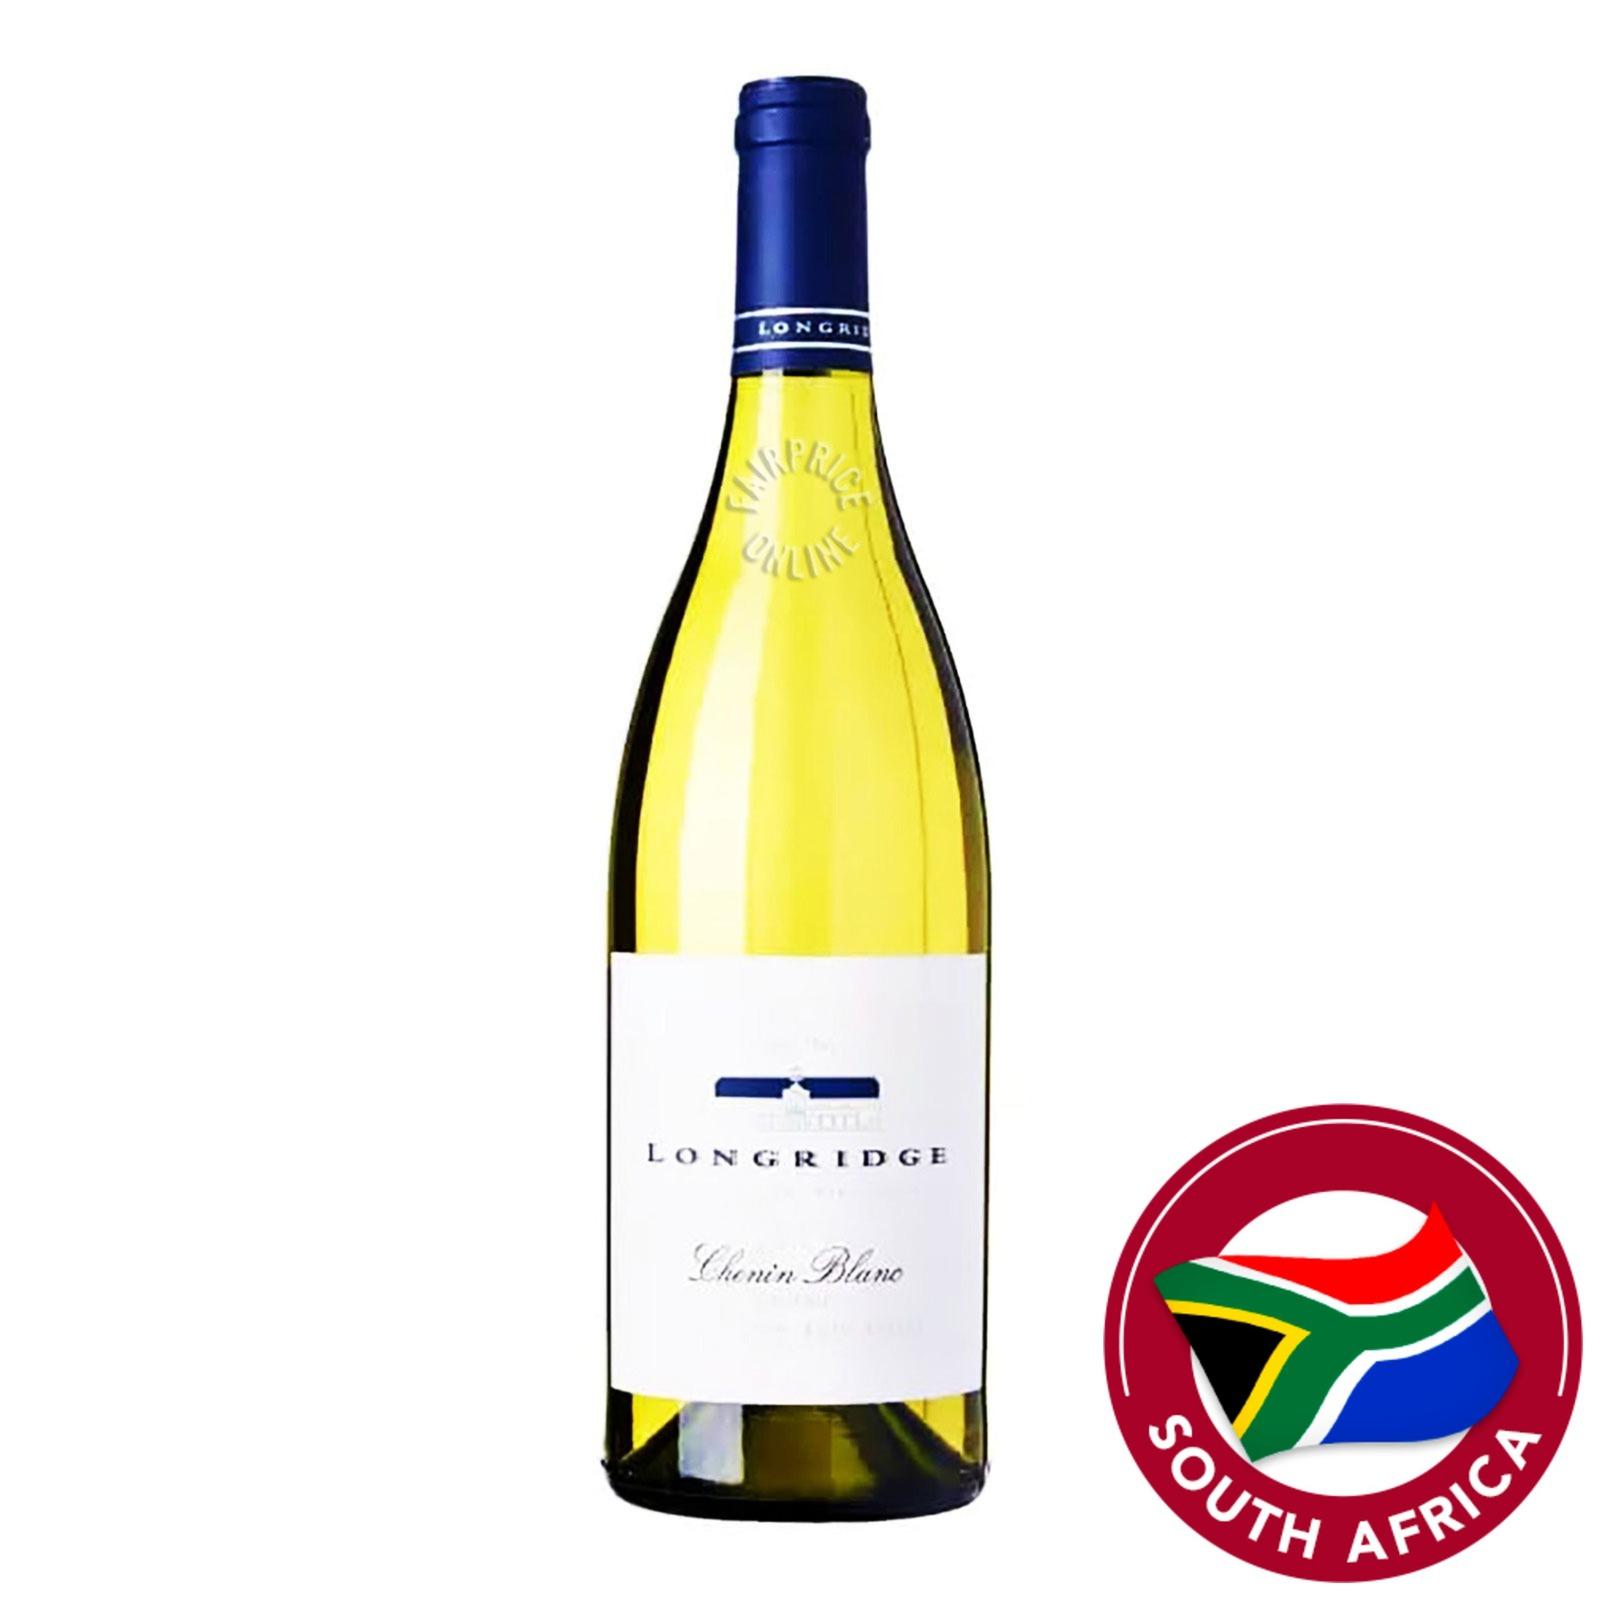 Longridge White Wine - Chenin Blanc